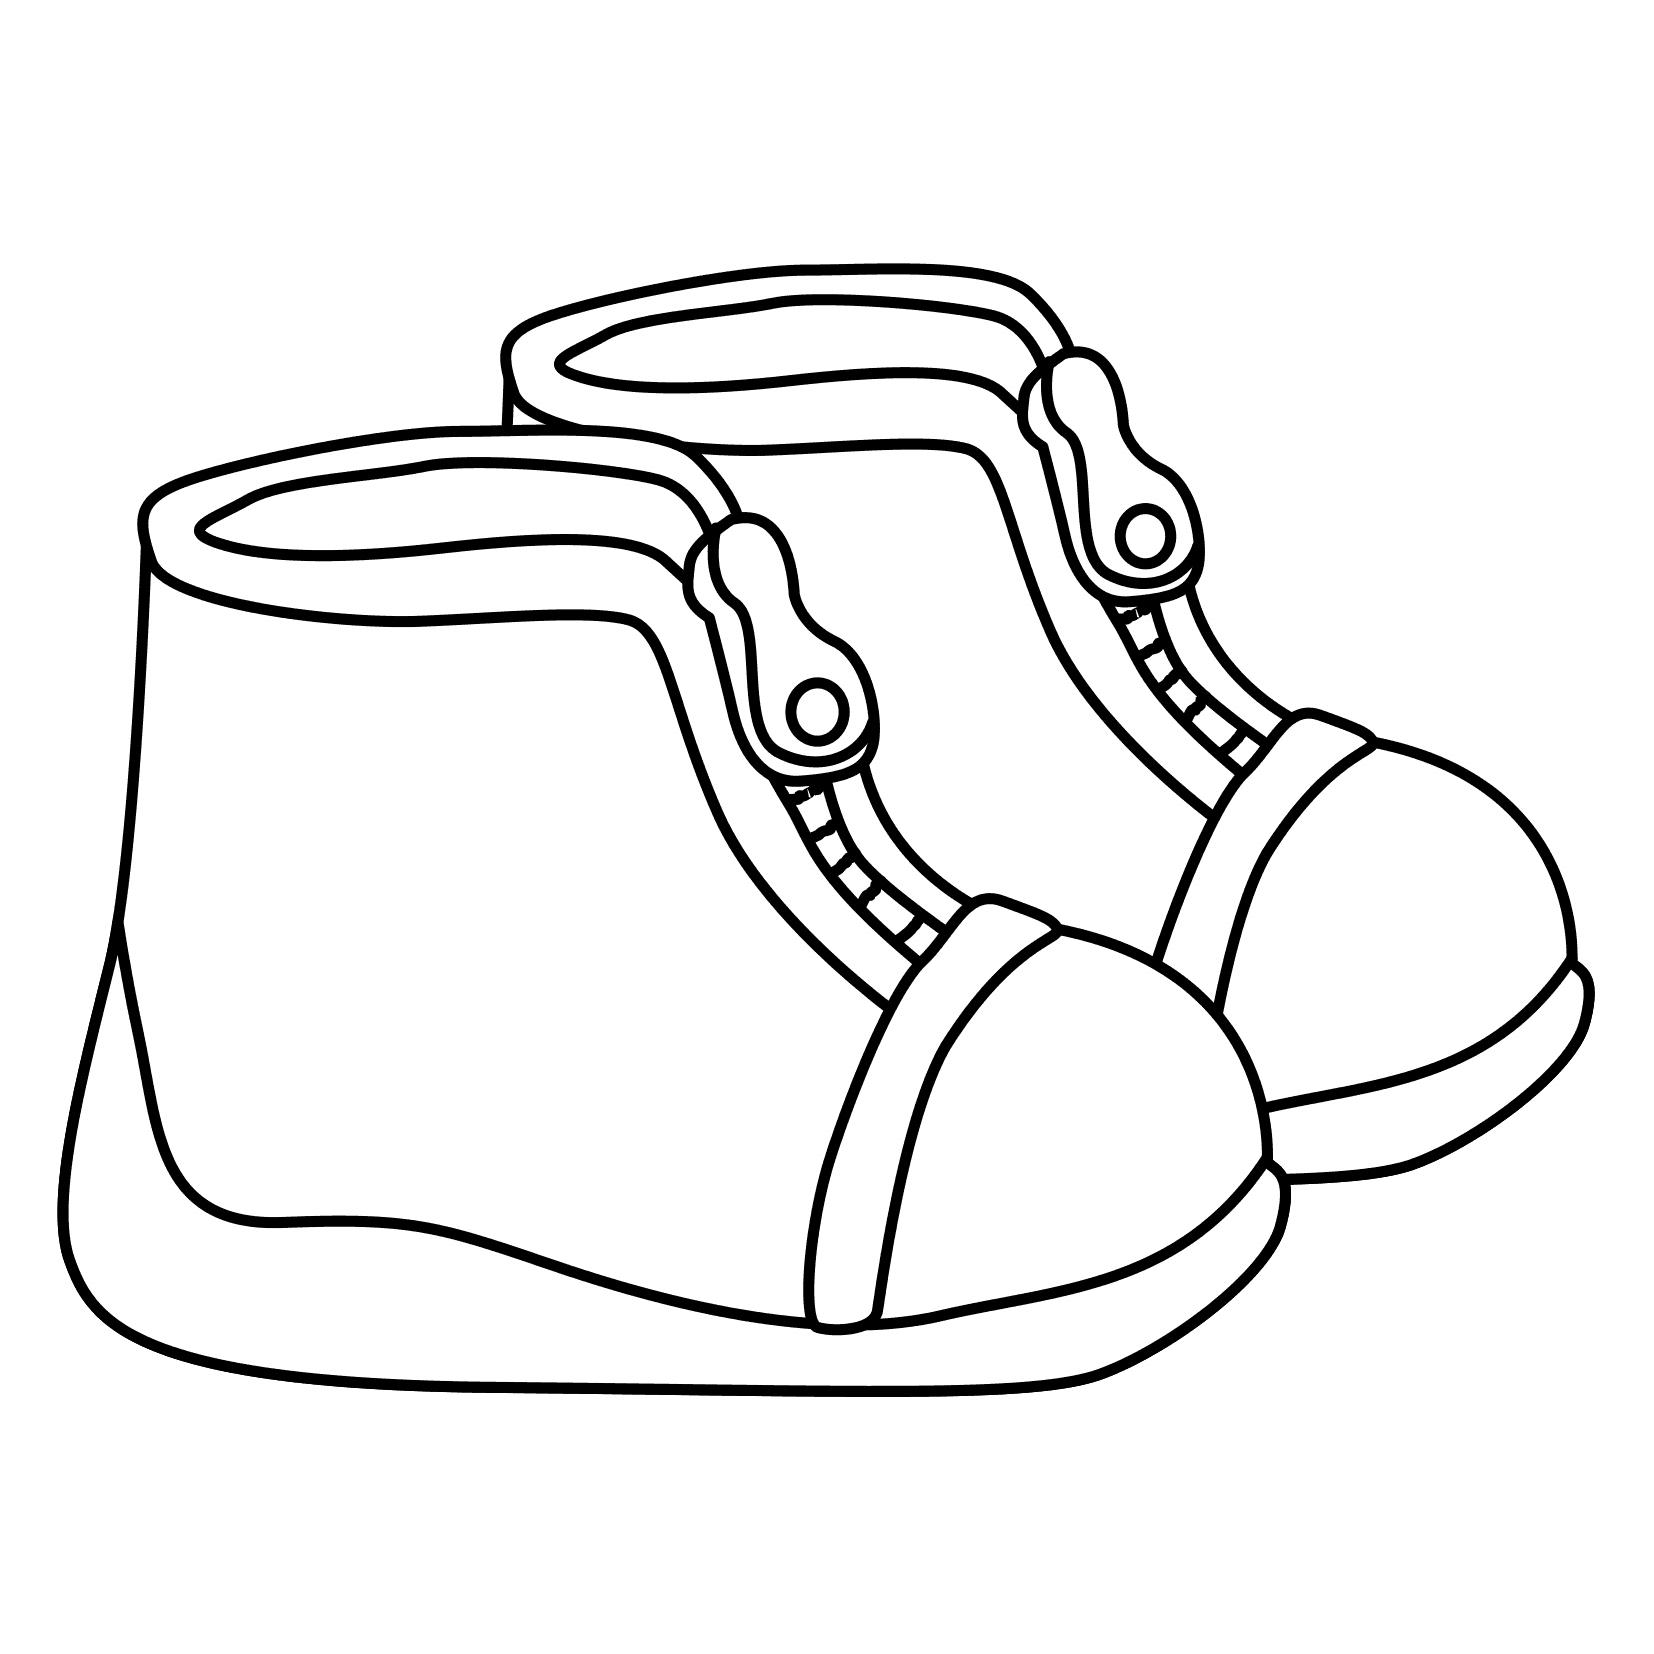 1654x1654 Shoe Coloring Page Unique Free Coloring Pages Of Shoes Logo